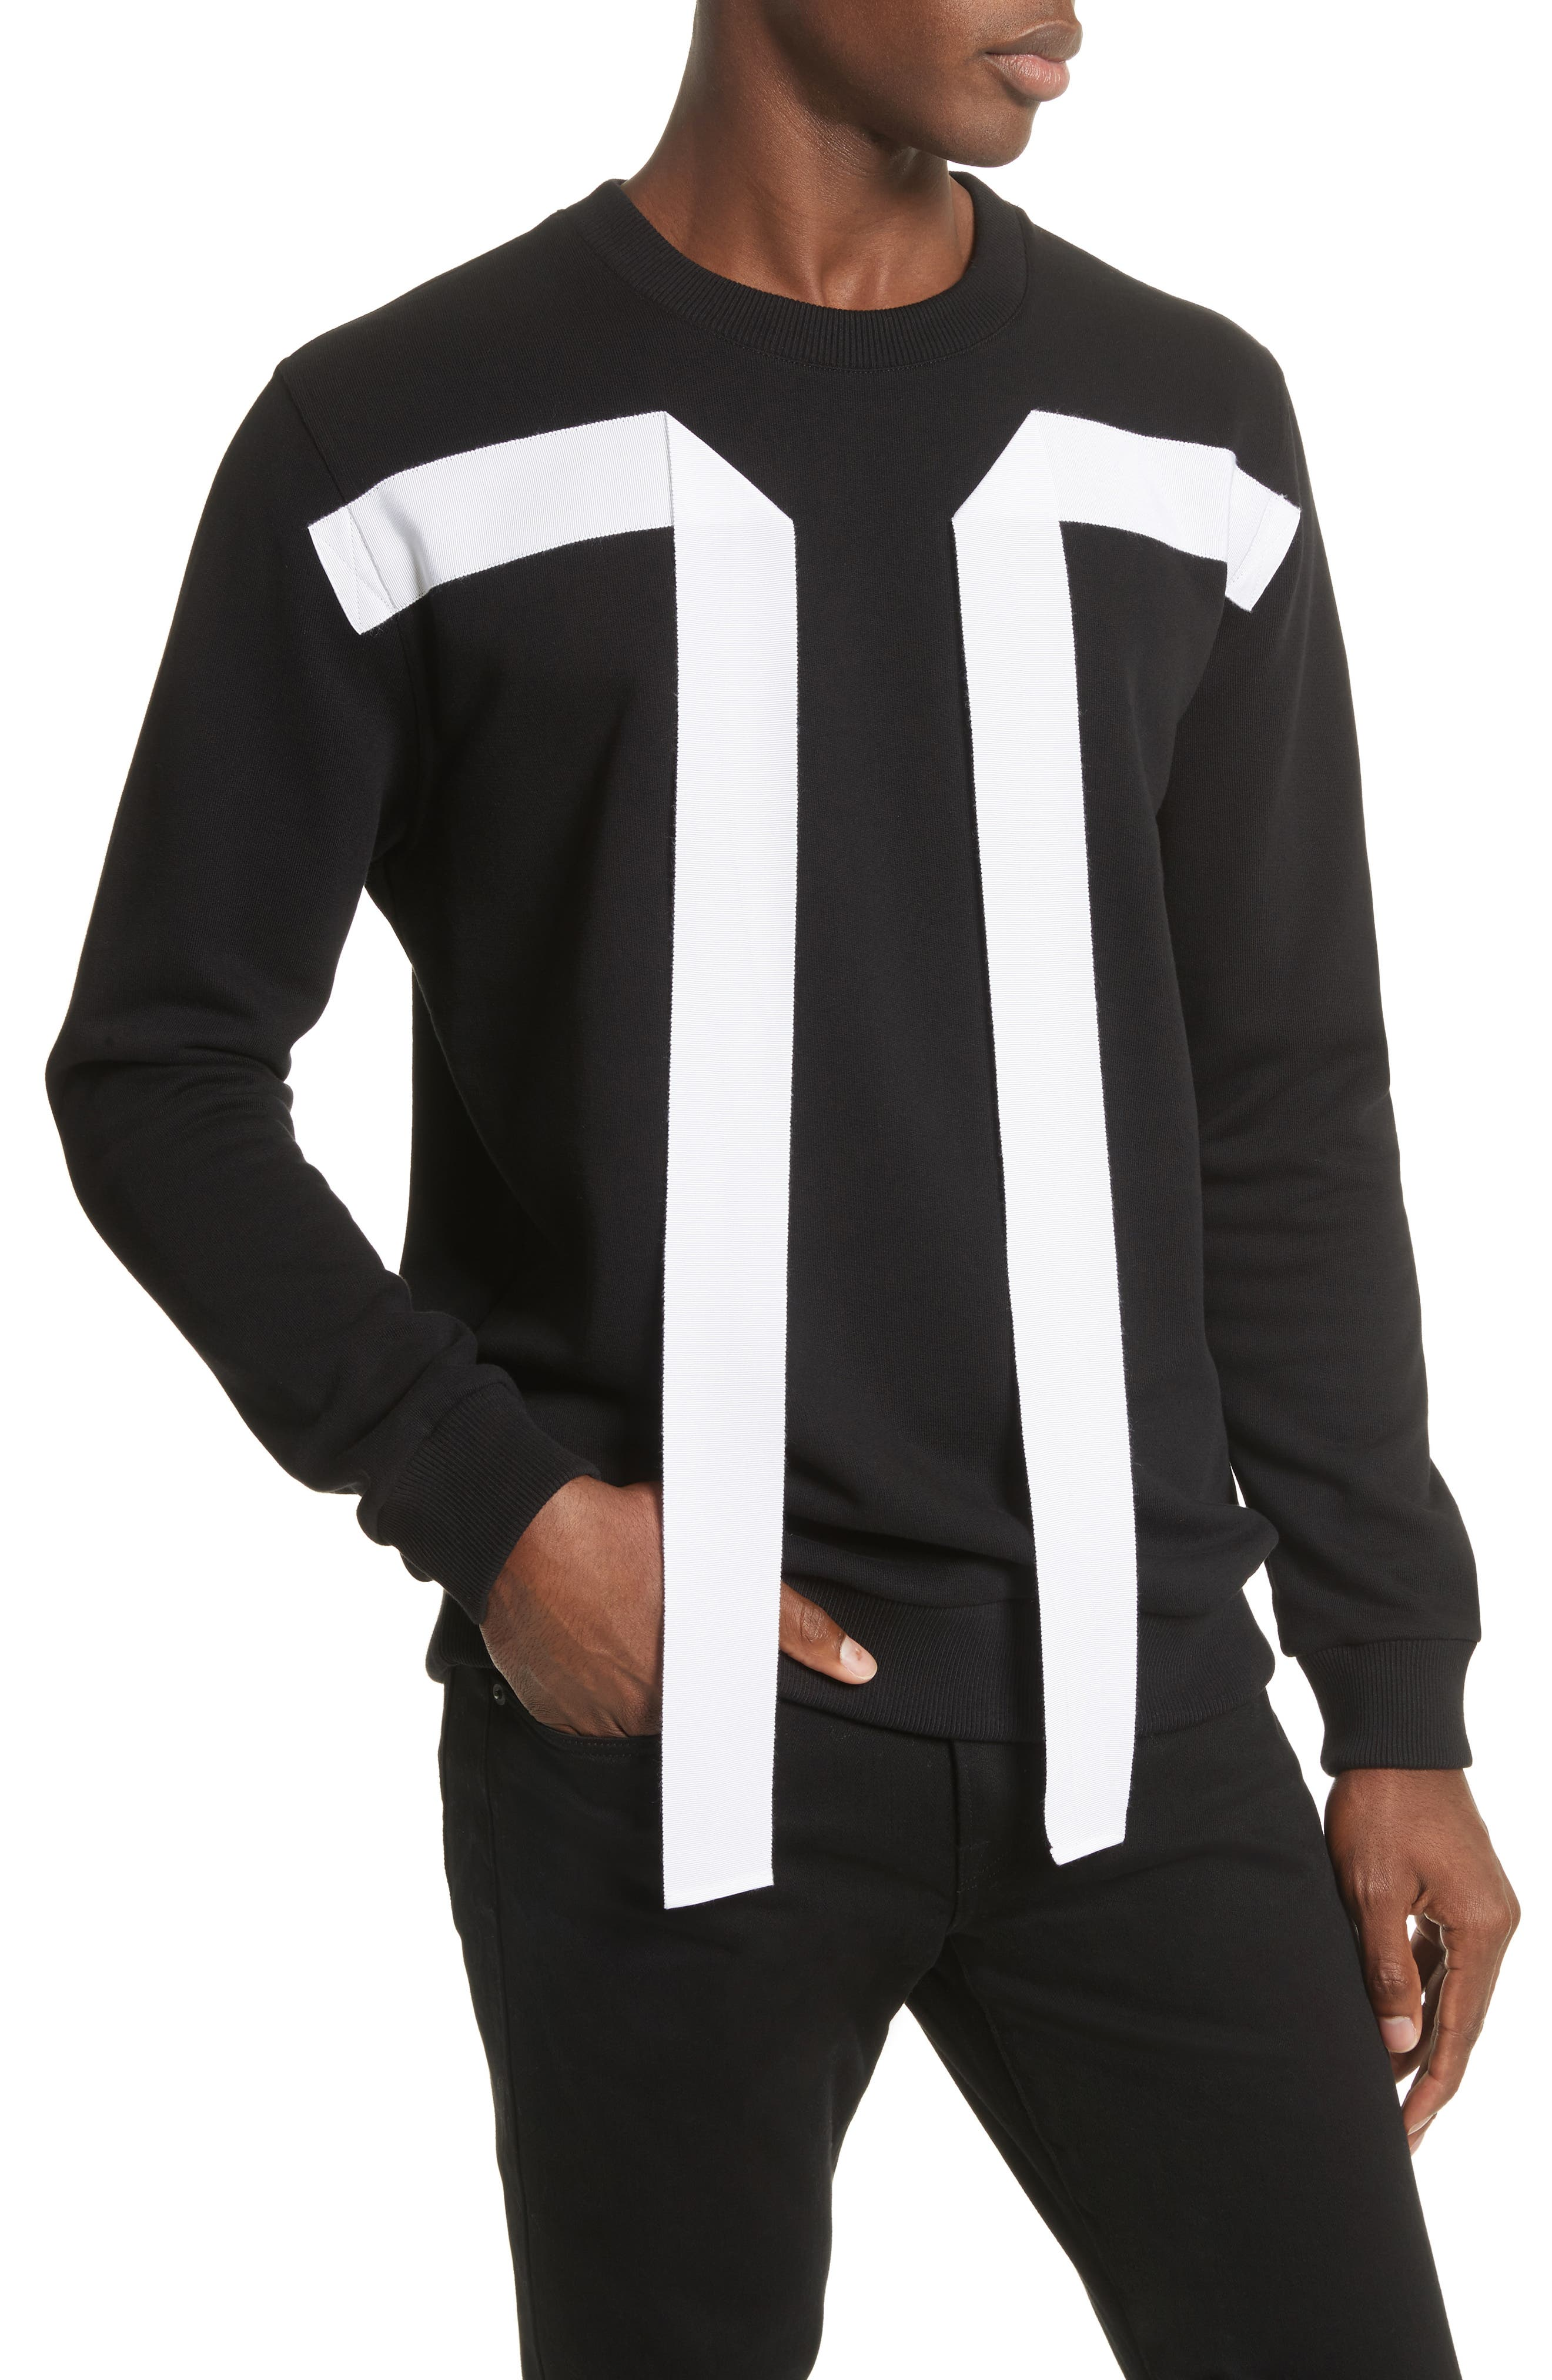 Flying Bands Crewneck Sweatshirt,                             Alternate thumbnail 4, color,                             Black